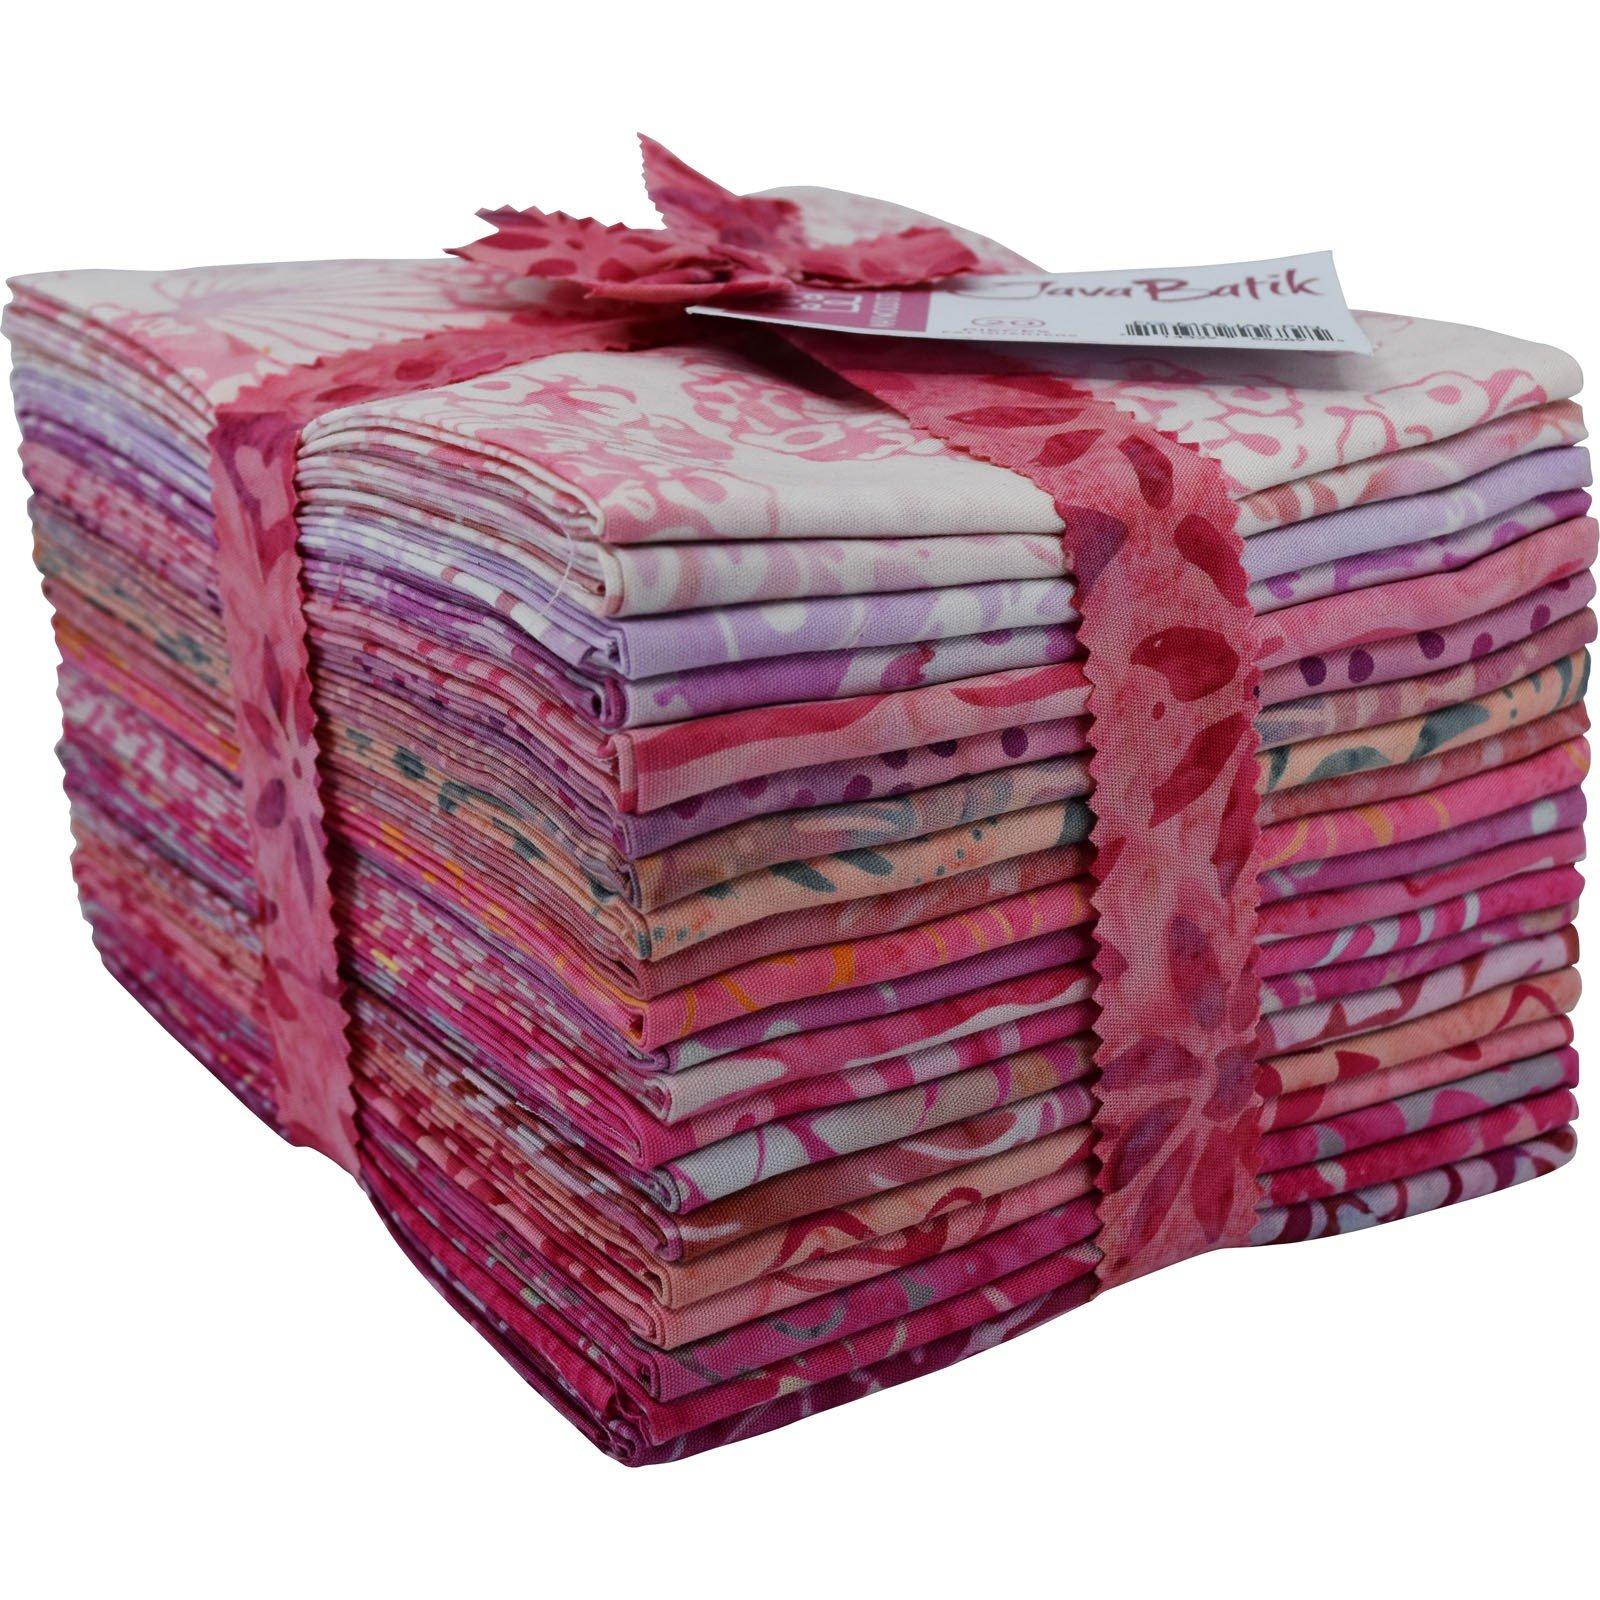 Maywood Java Batiks PINK Print Bundles Fat Quarters (20)